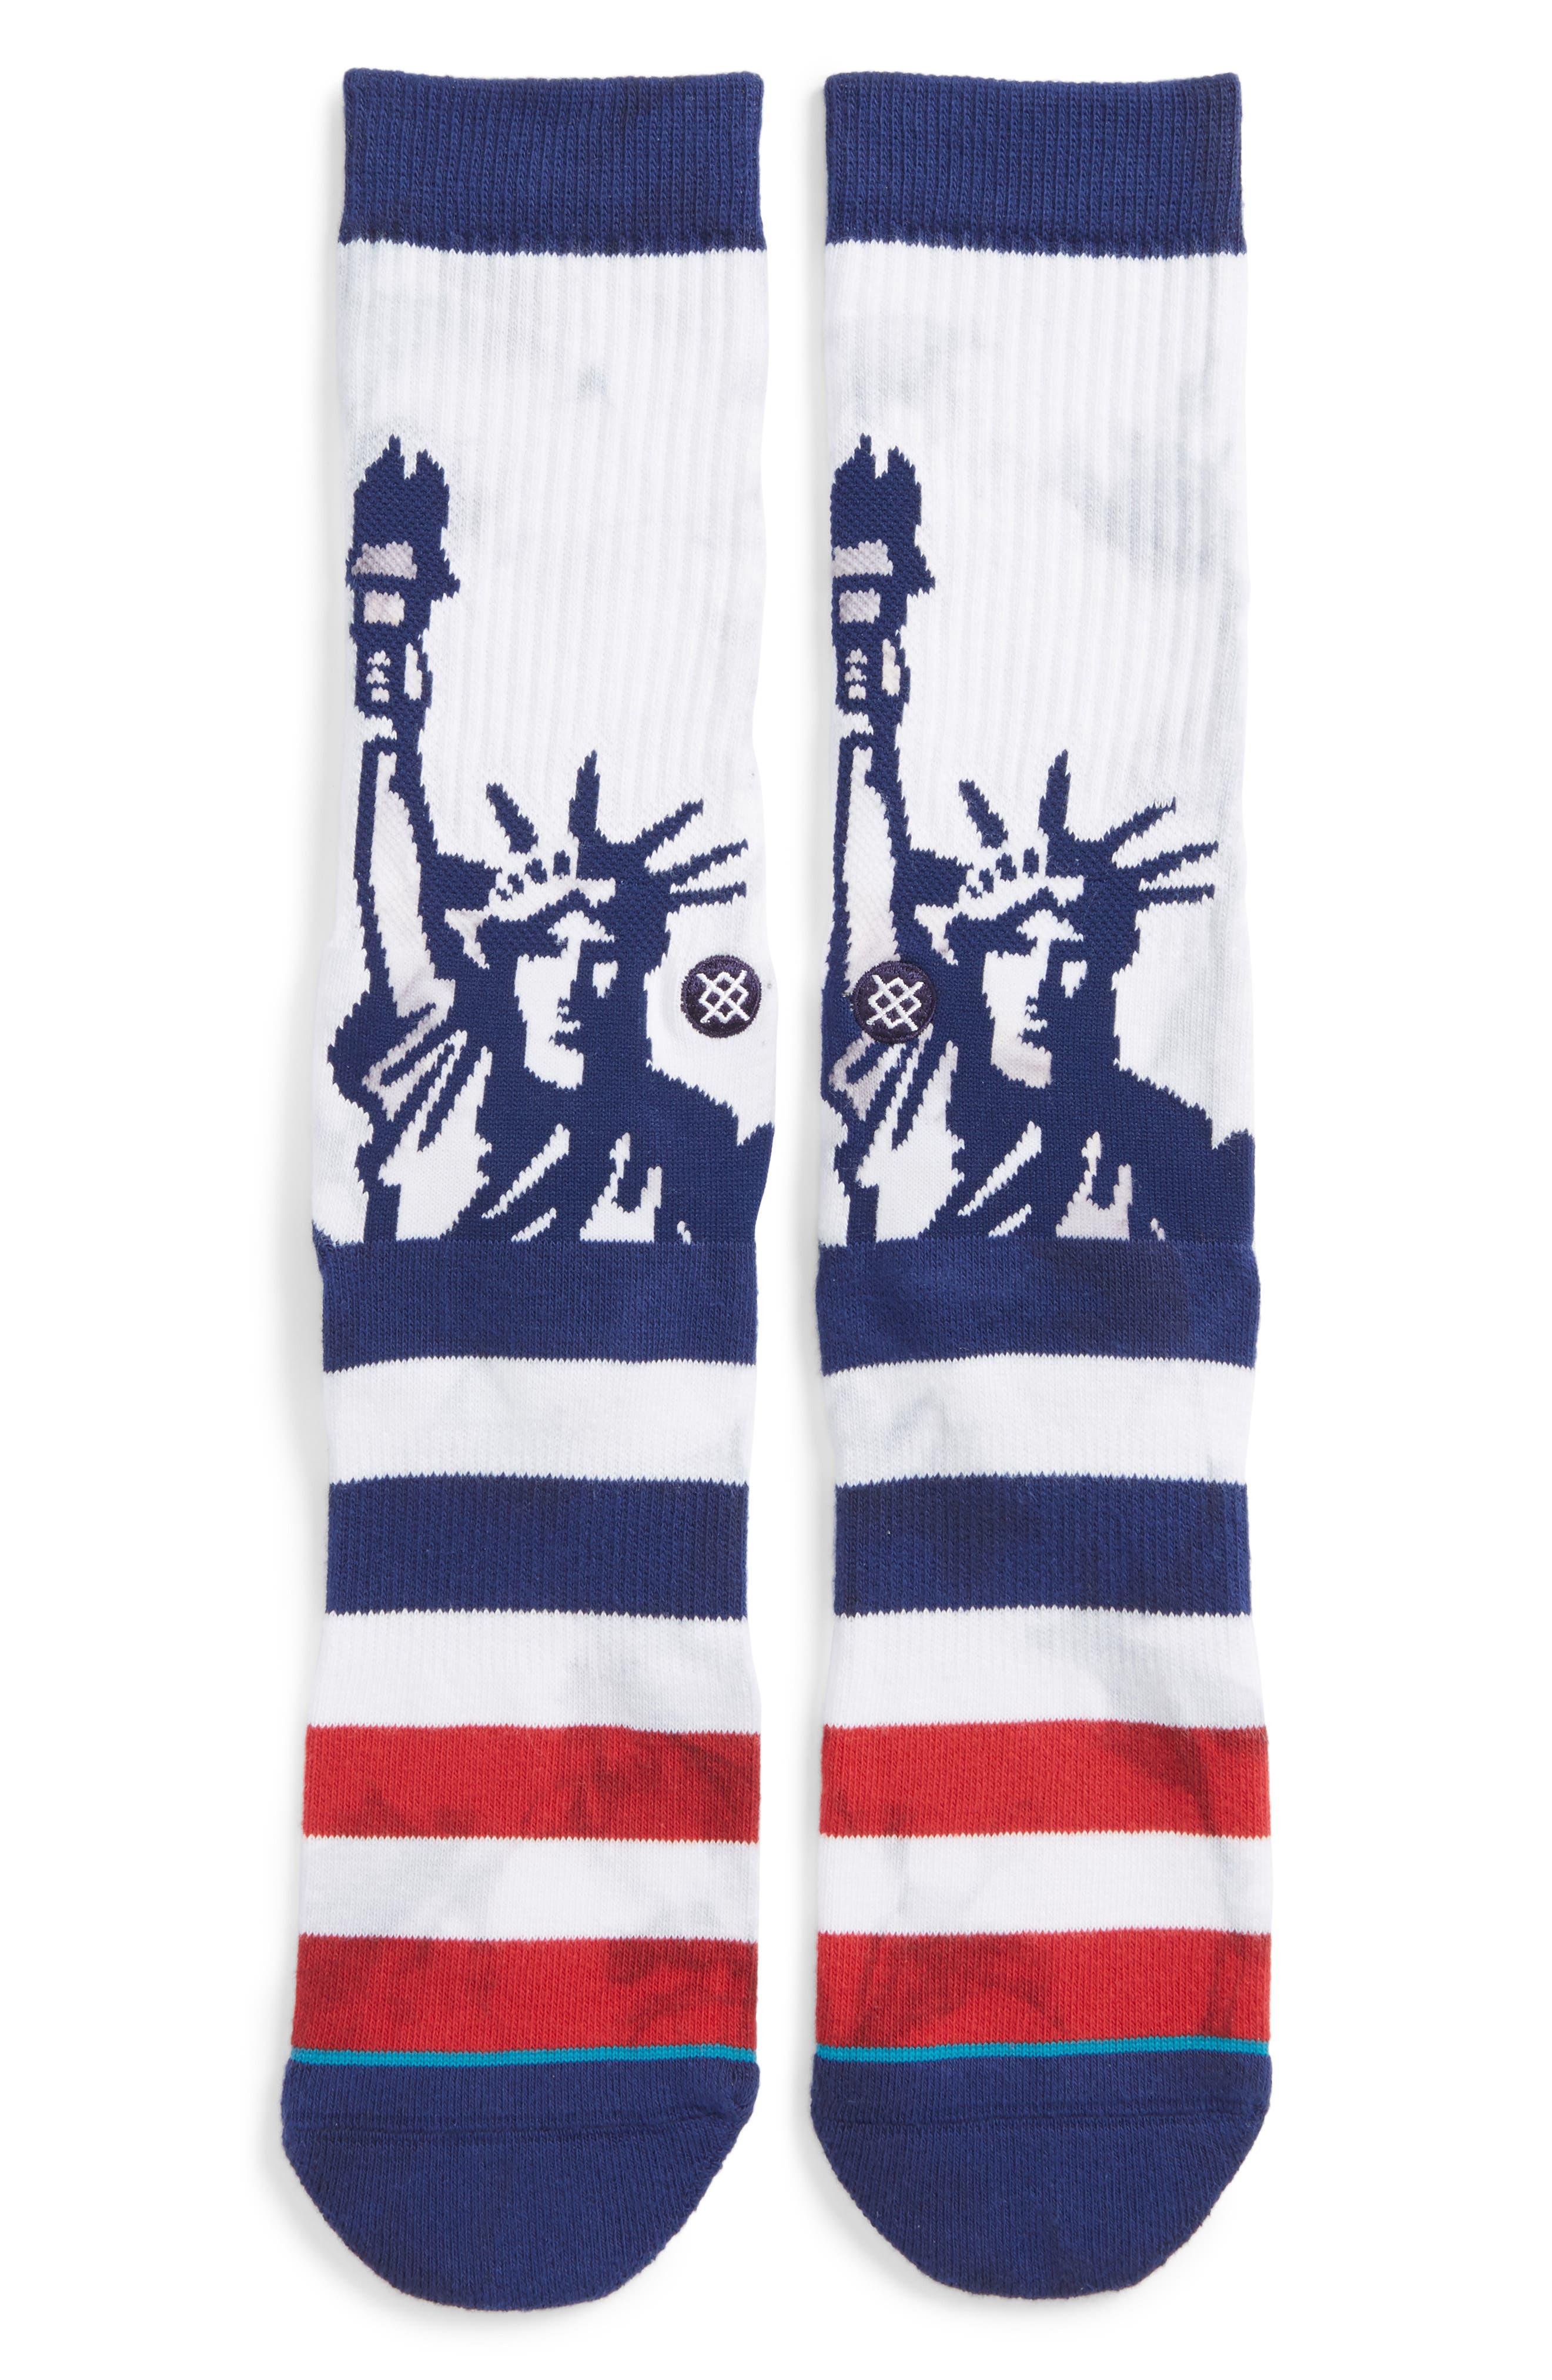 Liberties Crew Socks,                         Main,                         color, White/ Blue Multi